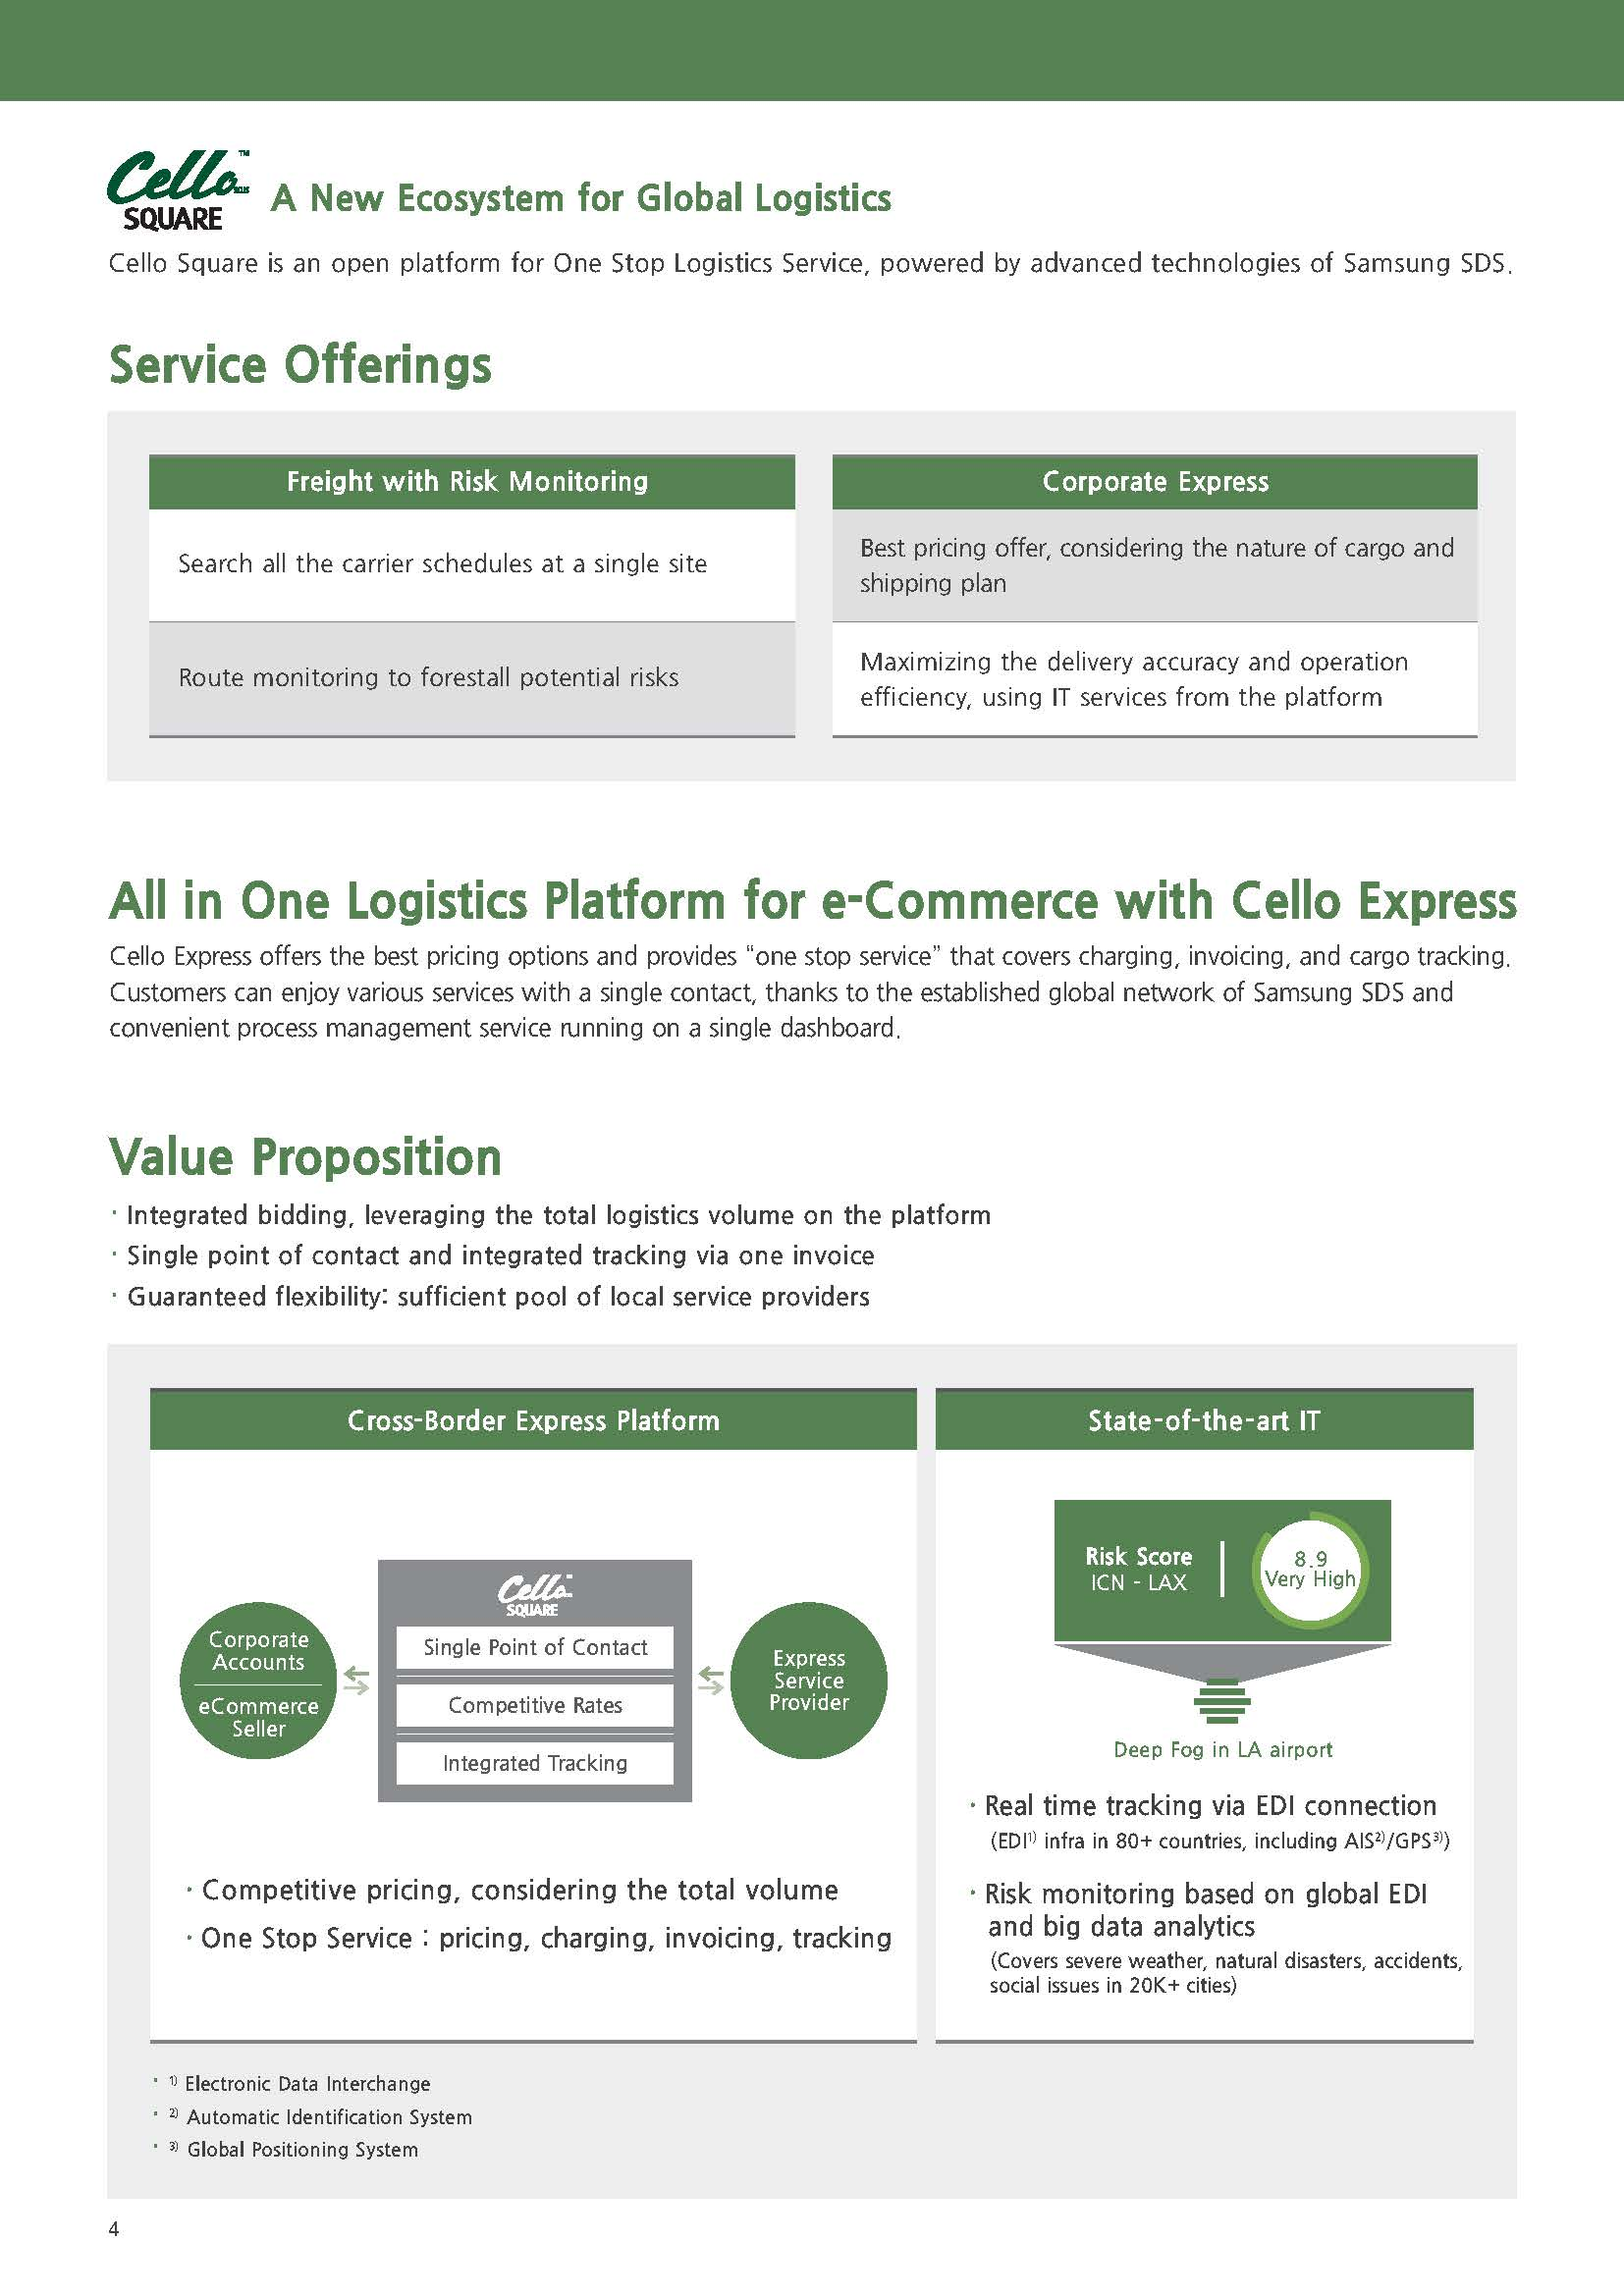 Cello Square, online logistics platform